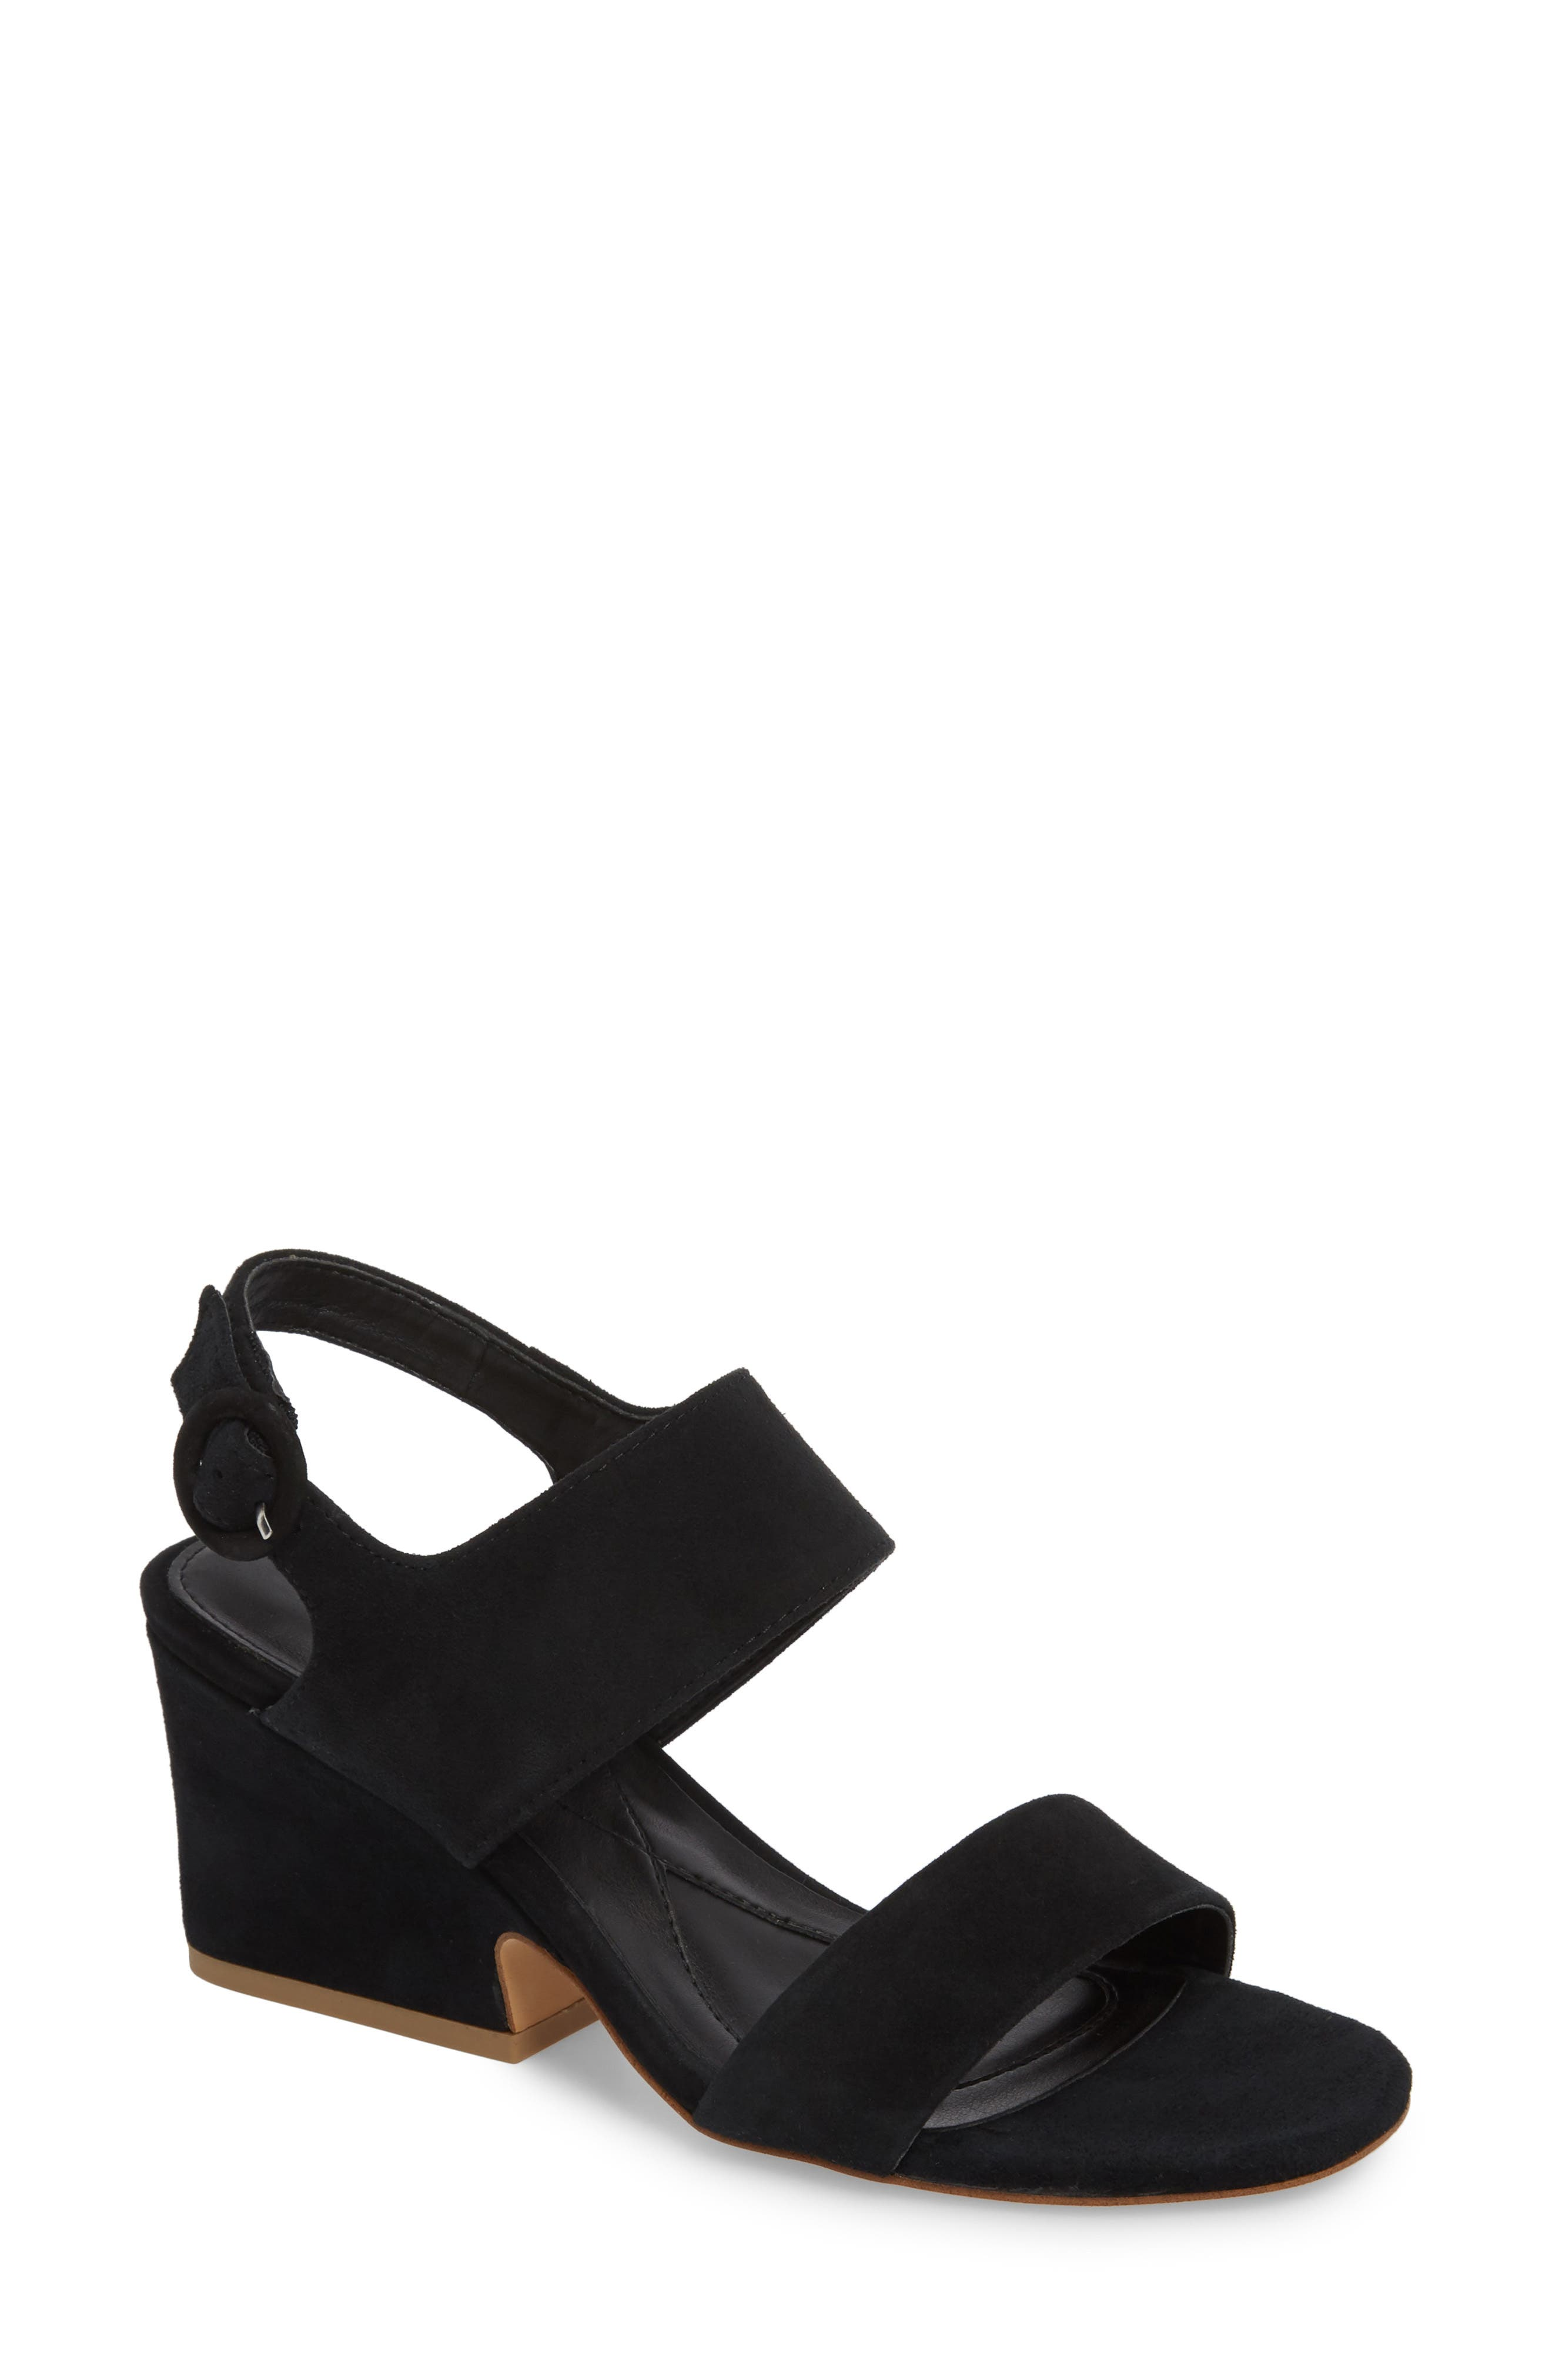 ISOLÁ, Isola Landra Block Heel Sandal, Main thumbnail 1, color, BLACK SUEDE